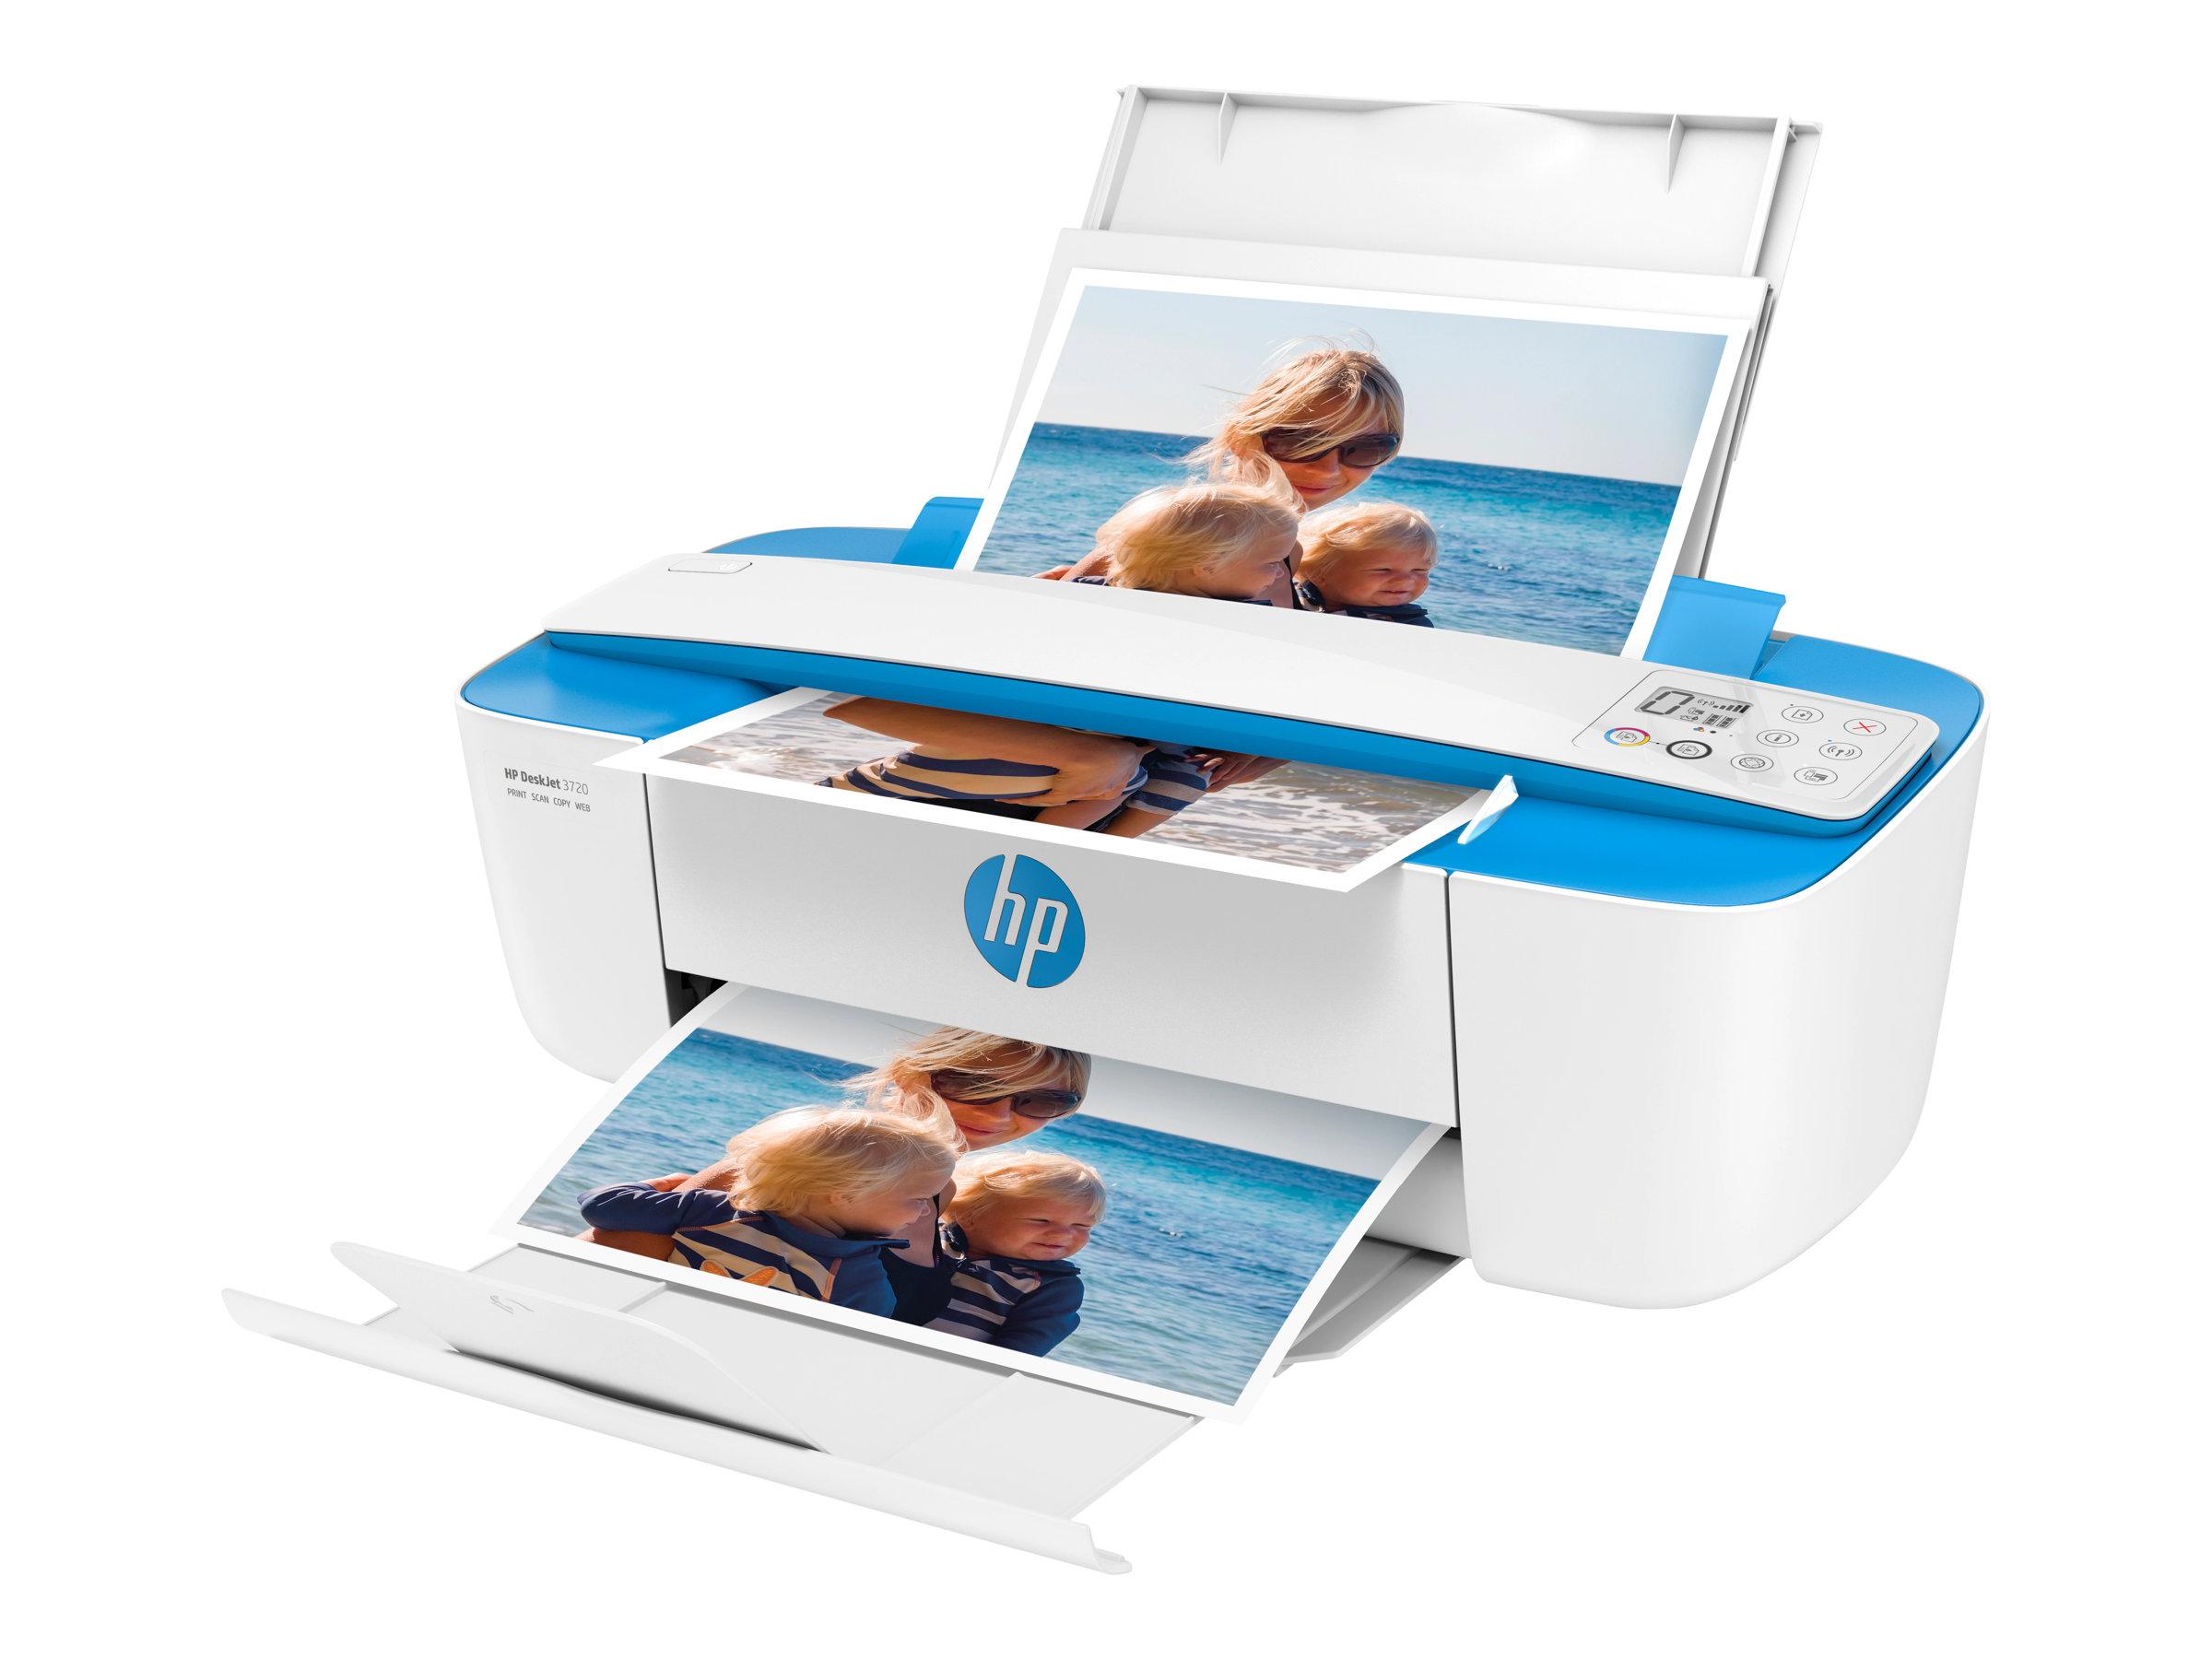 HP Deskjet 3760 All-in-One - Multifunktionsdrucker - Farbe - Tintenstrahl - 216 x 355 mm (Original)